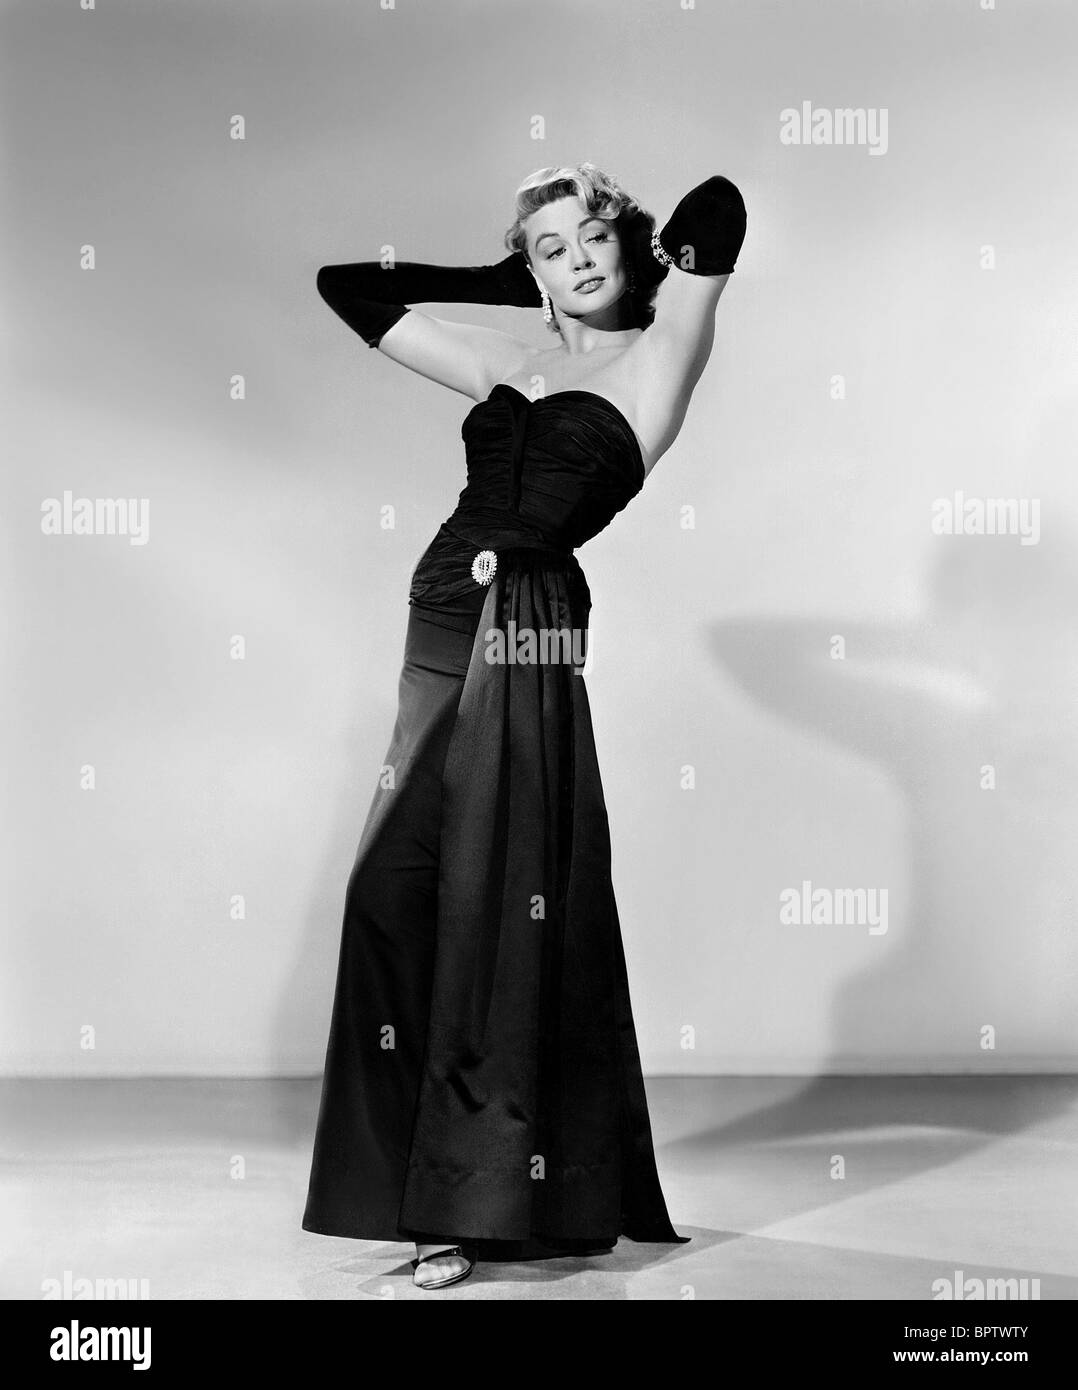 DOROTHY MALONE ACTRESS (1956) - Stock Image